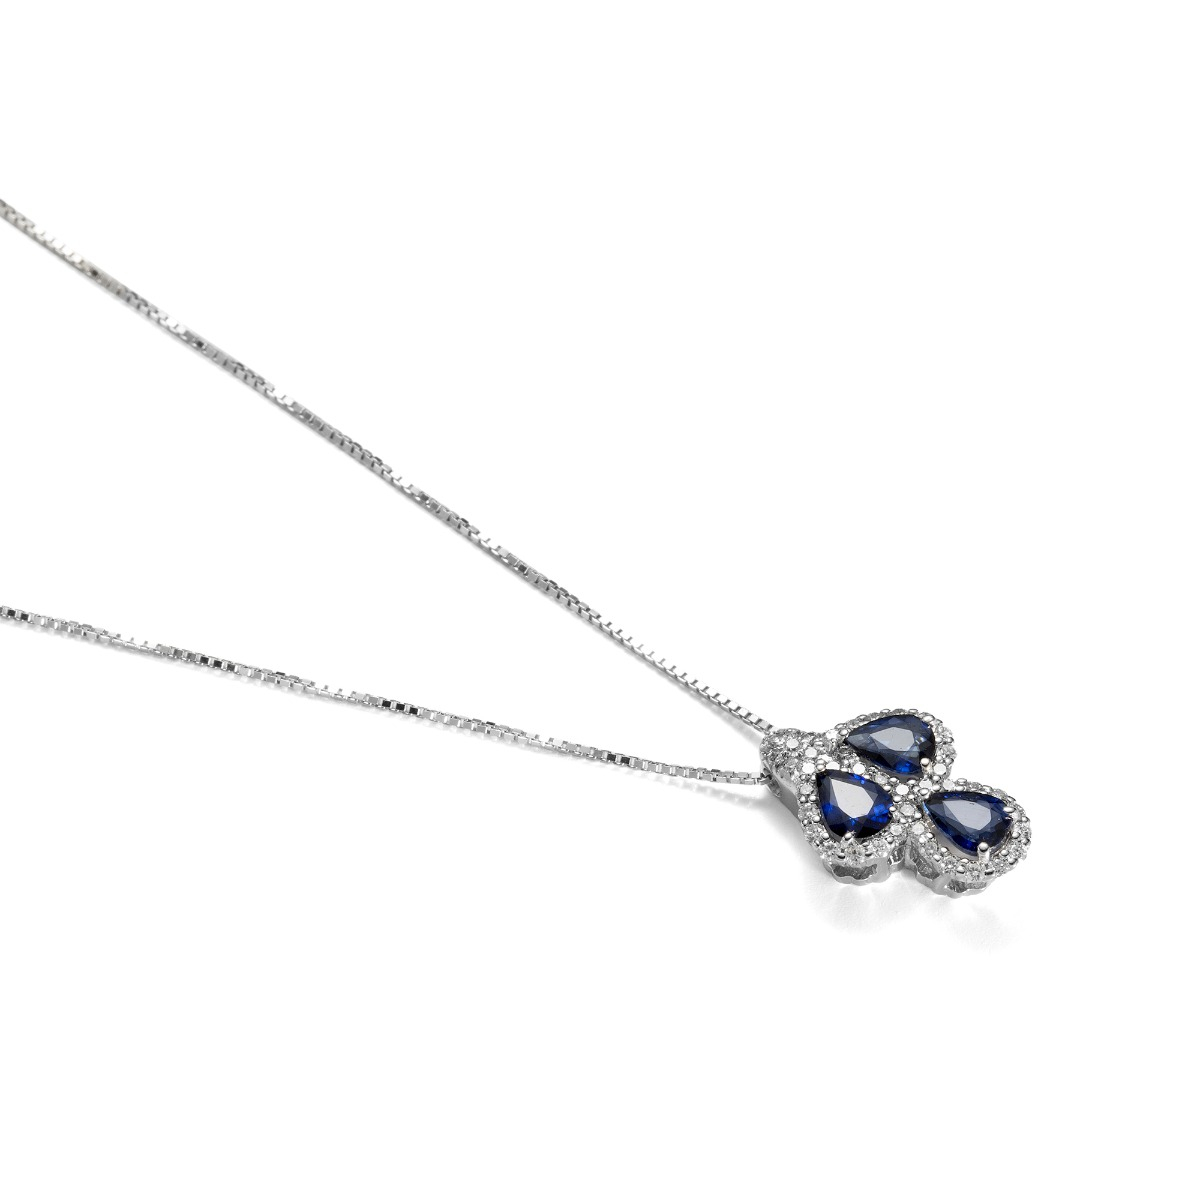 Three-Drop Sapphire Pendant Necklace with Diamonds